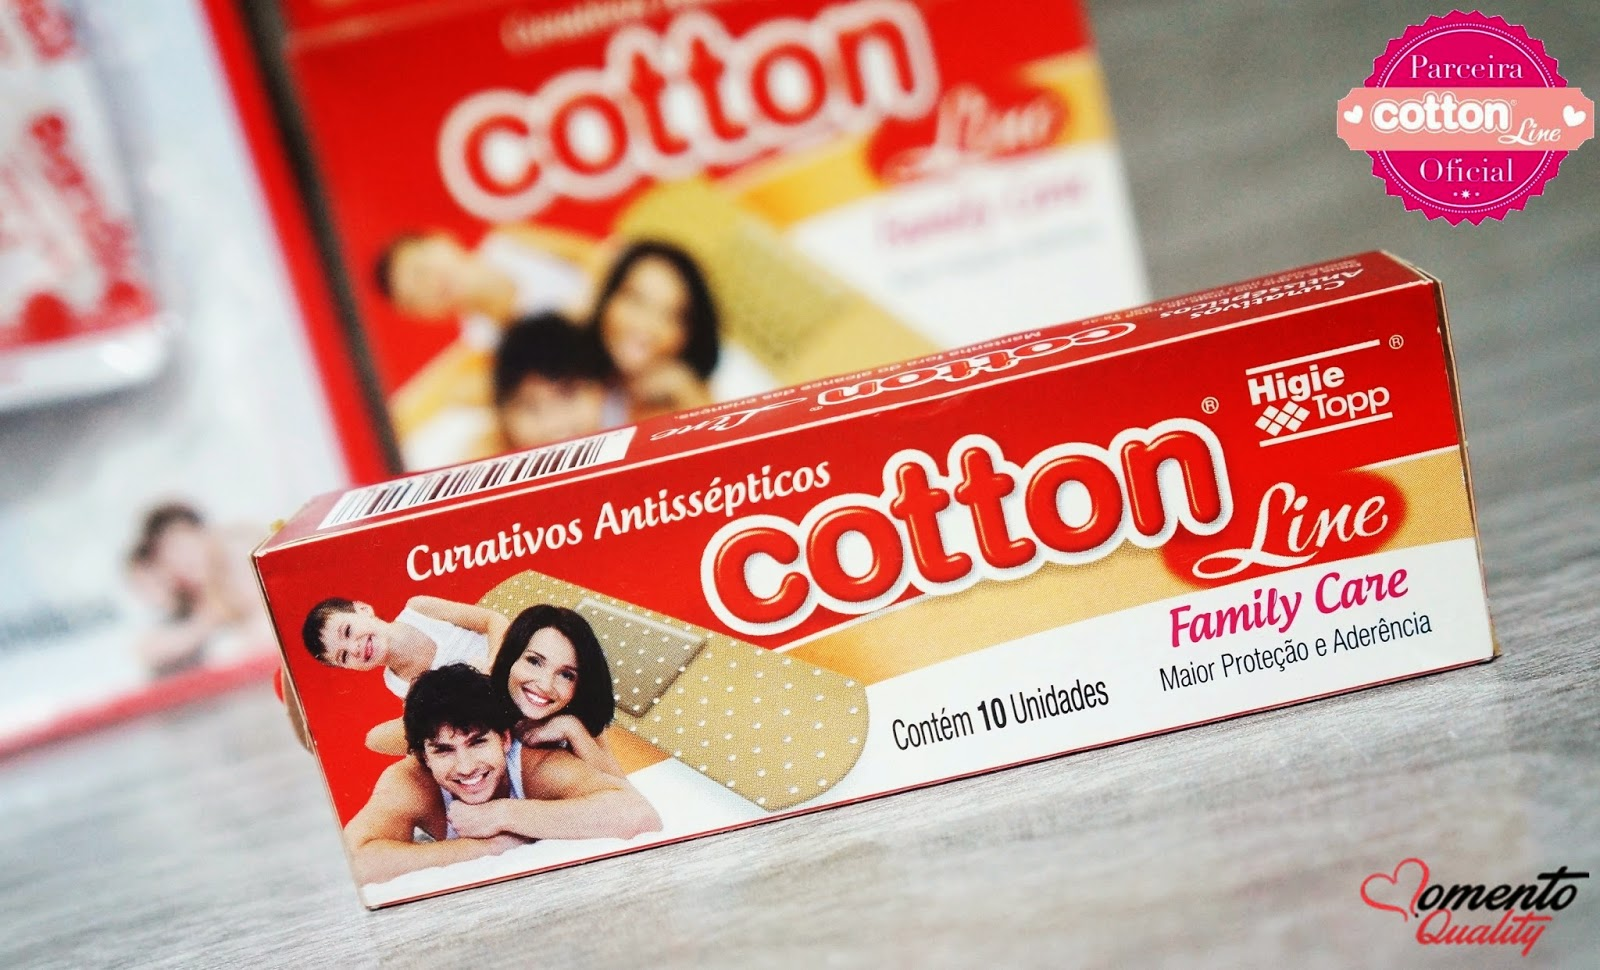 Curativos Antisépticos Cotton Line